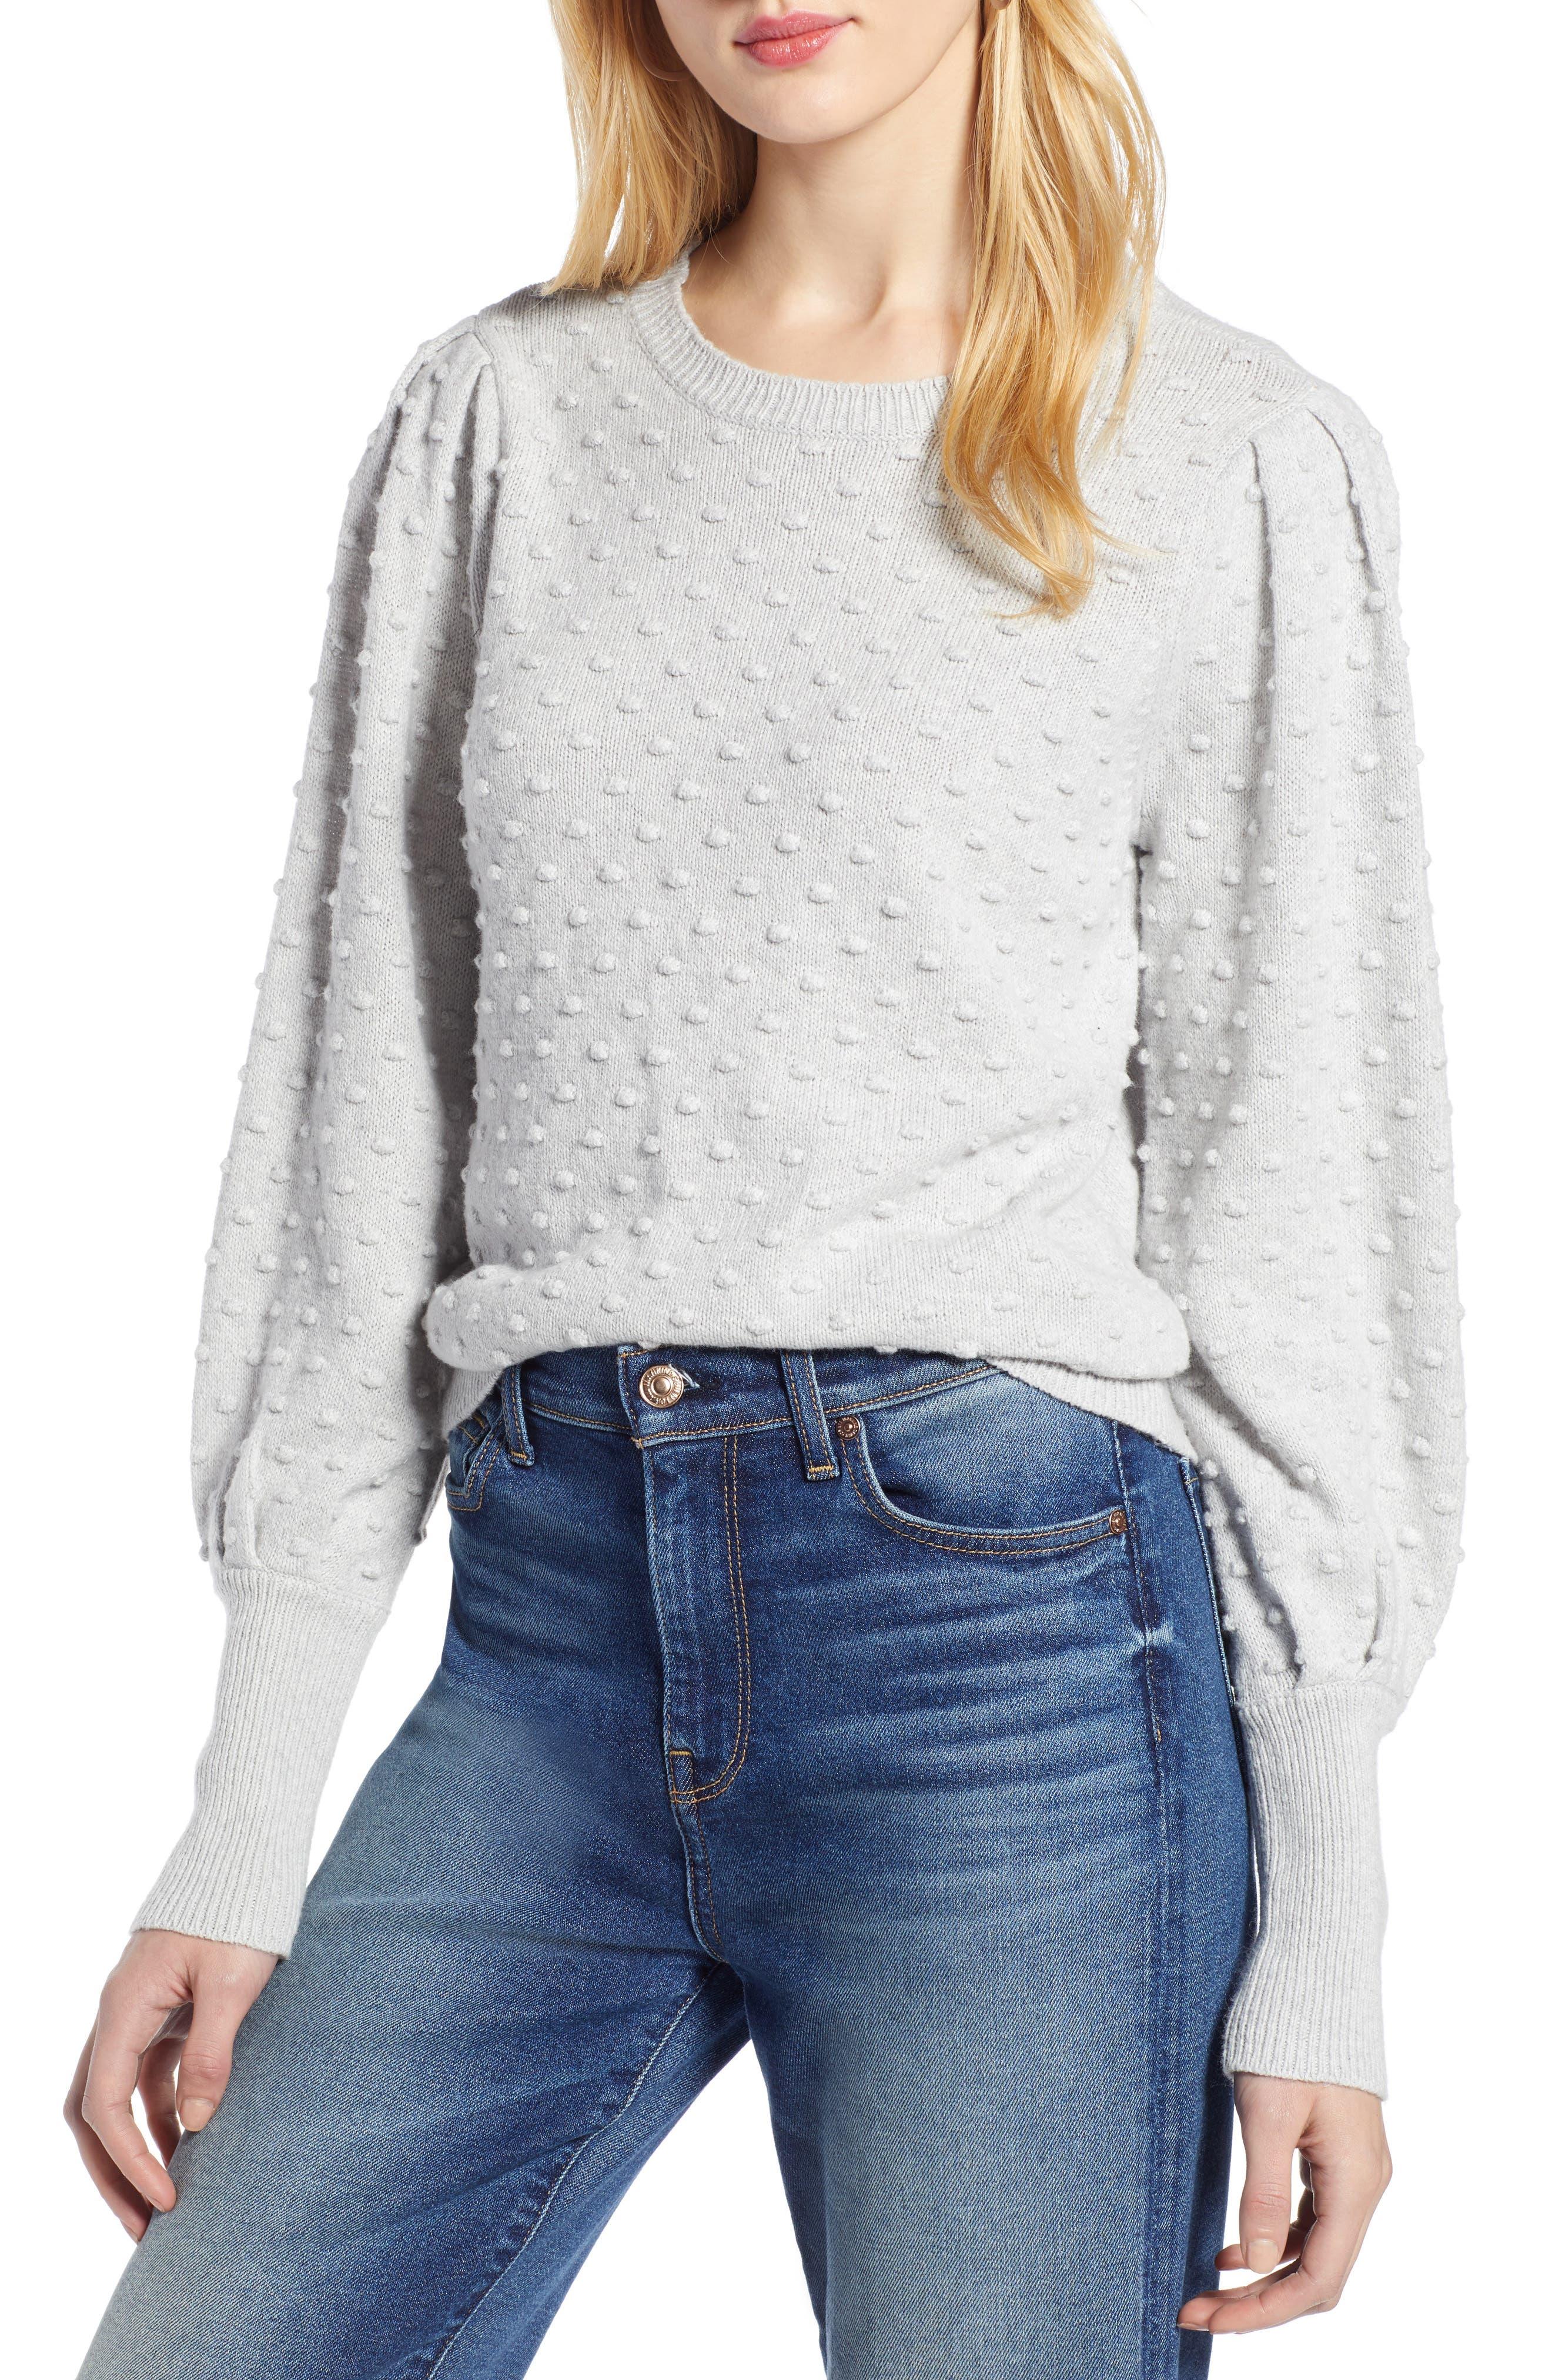 Bobble Stitch Sweater,                             Main thumbnail 1, color,                             GREY LIGHT HEATHER